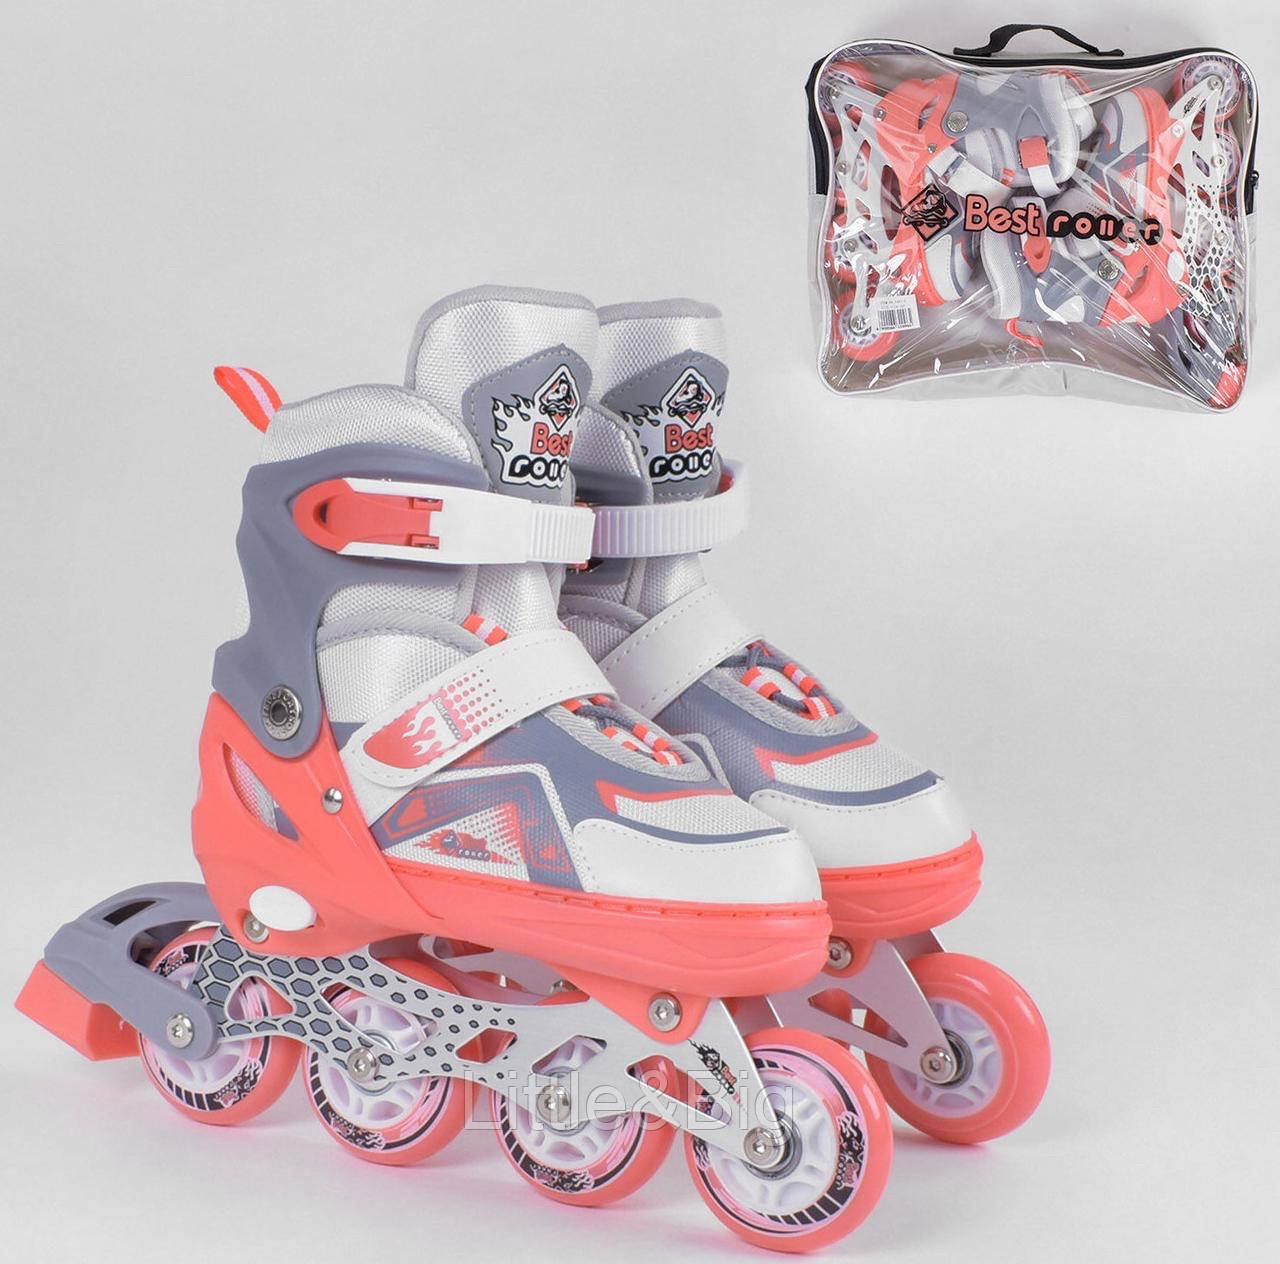 Ролики Best Rollers (Бело-коралловые) арт. 5401 размер S /30-33/ колёса PU